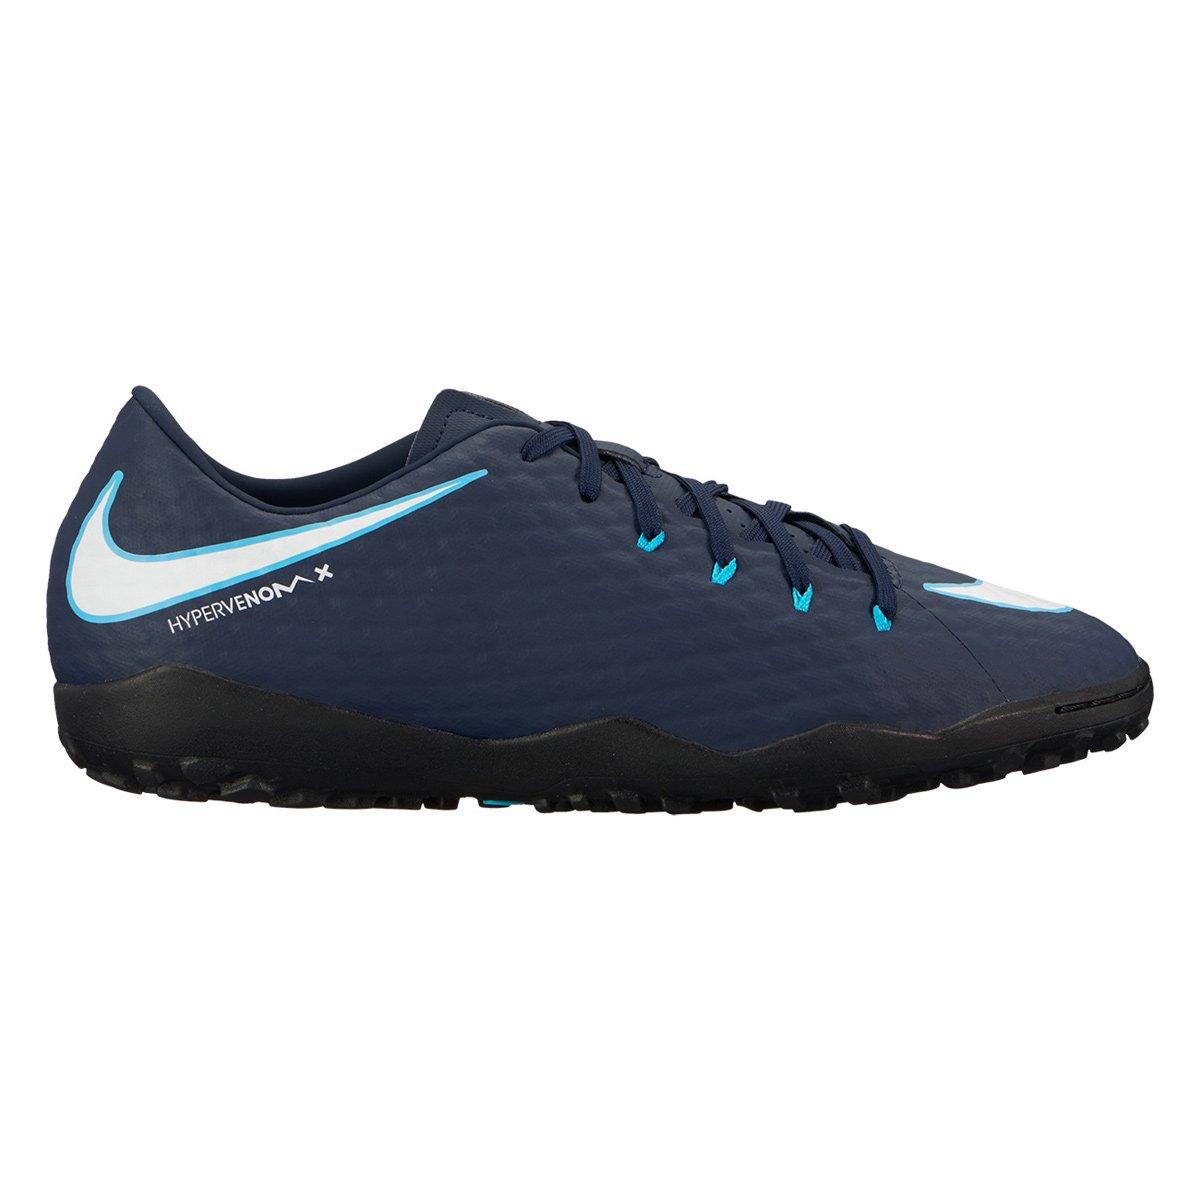 buy online 4ecf4 1ad1a Chuteira Society Nike Hypervenom Phelon 3 TF   Allianz Parque Shop